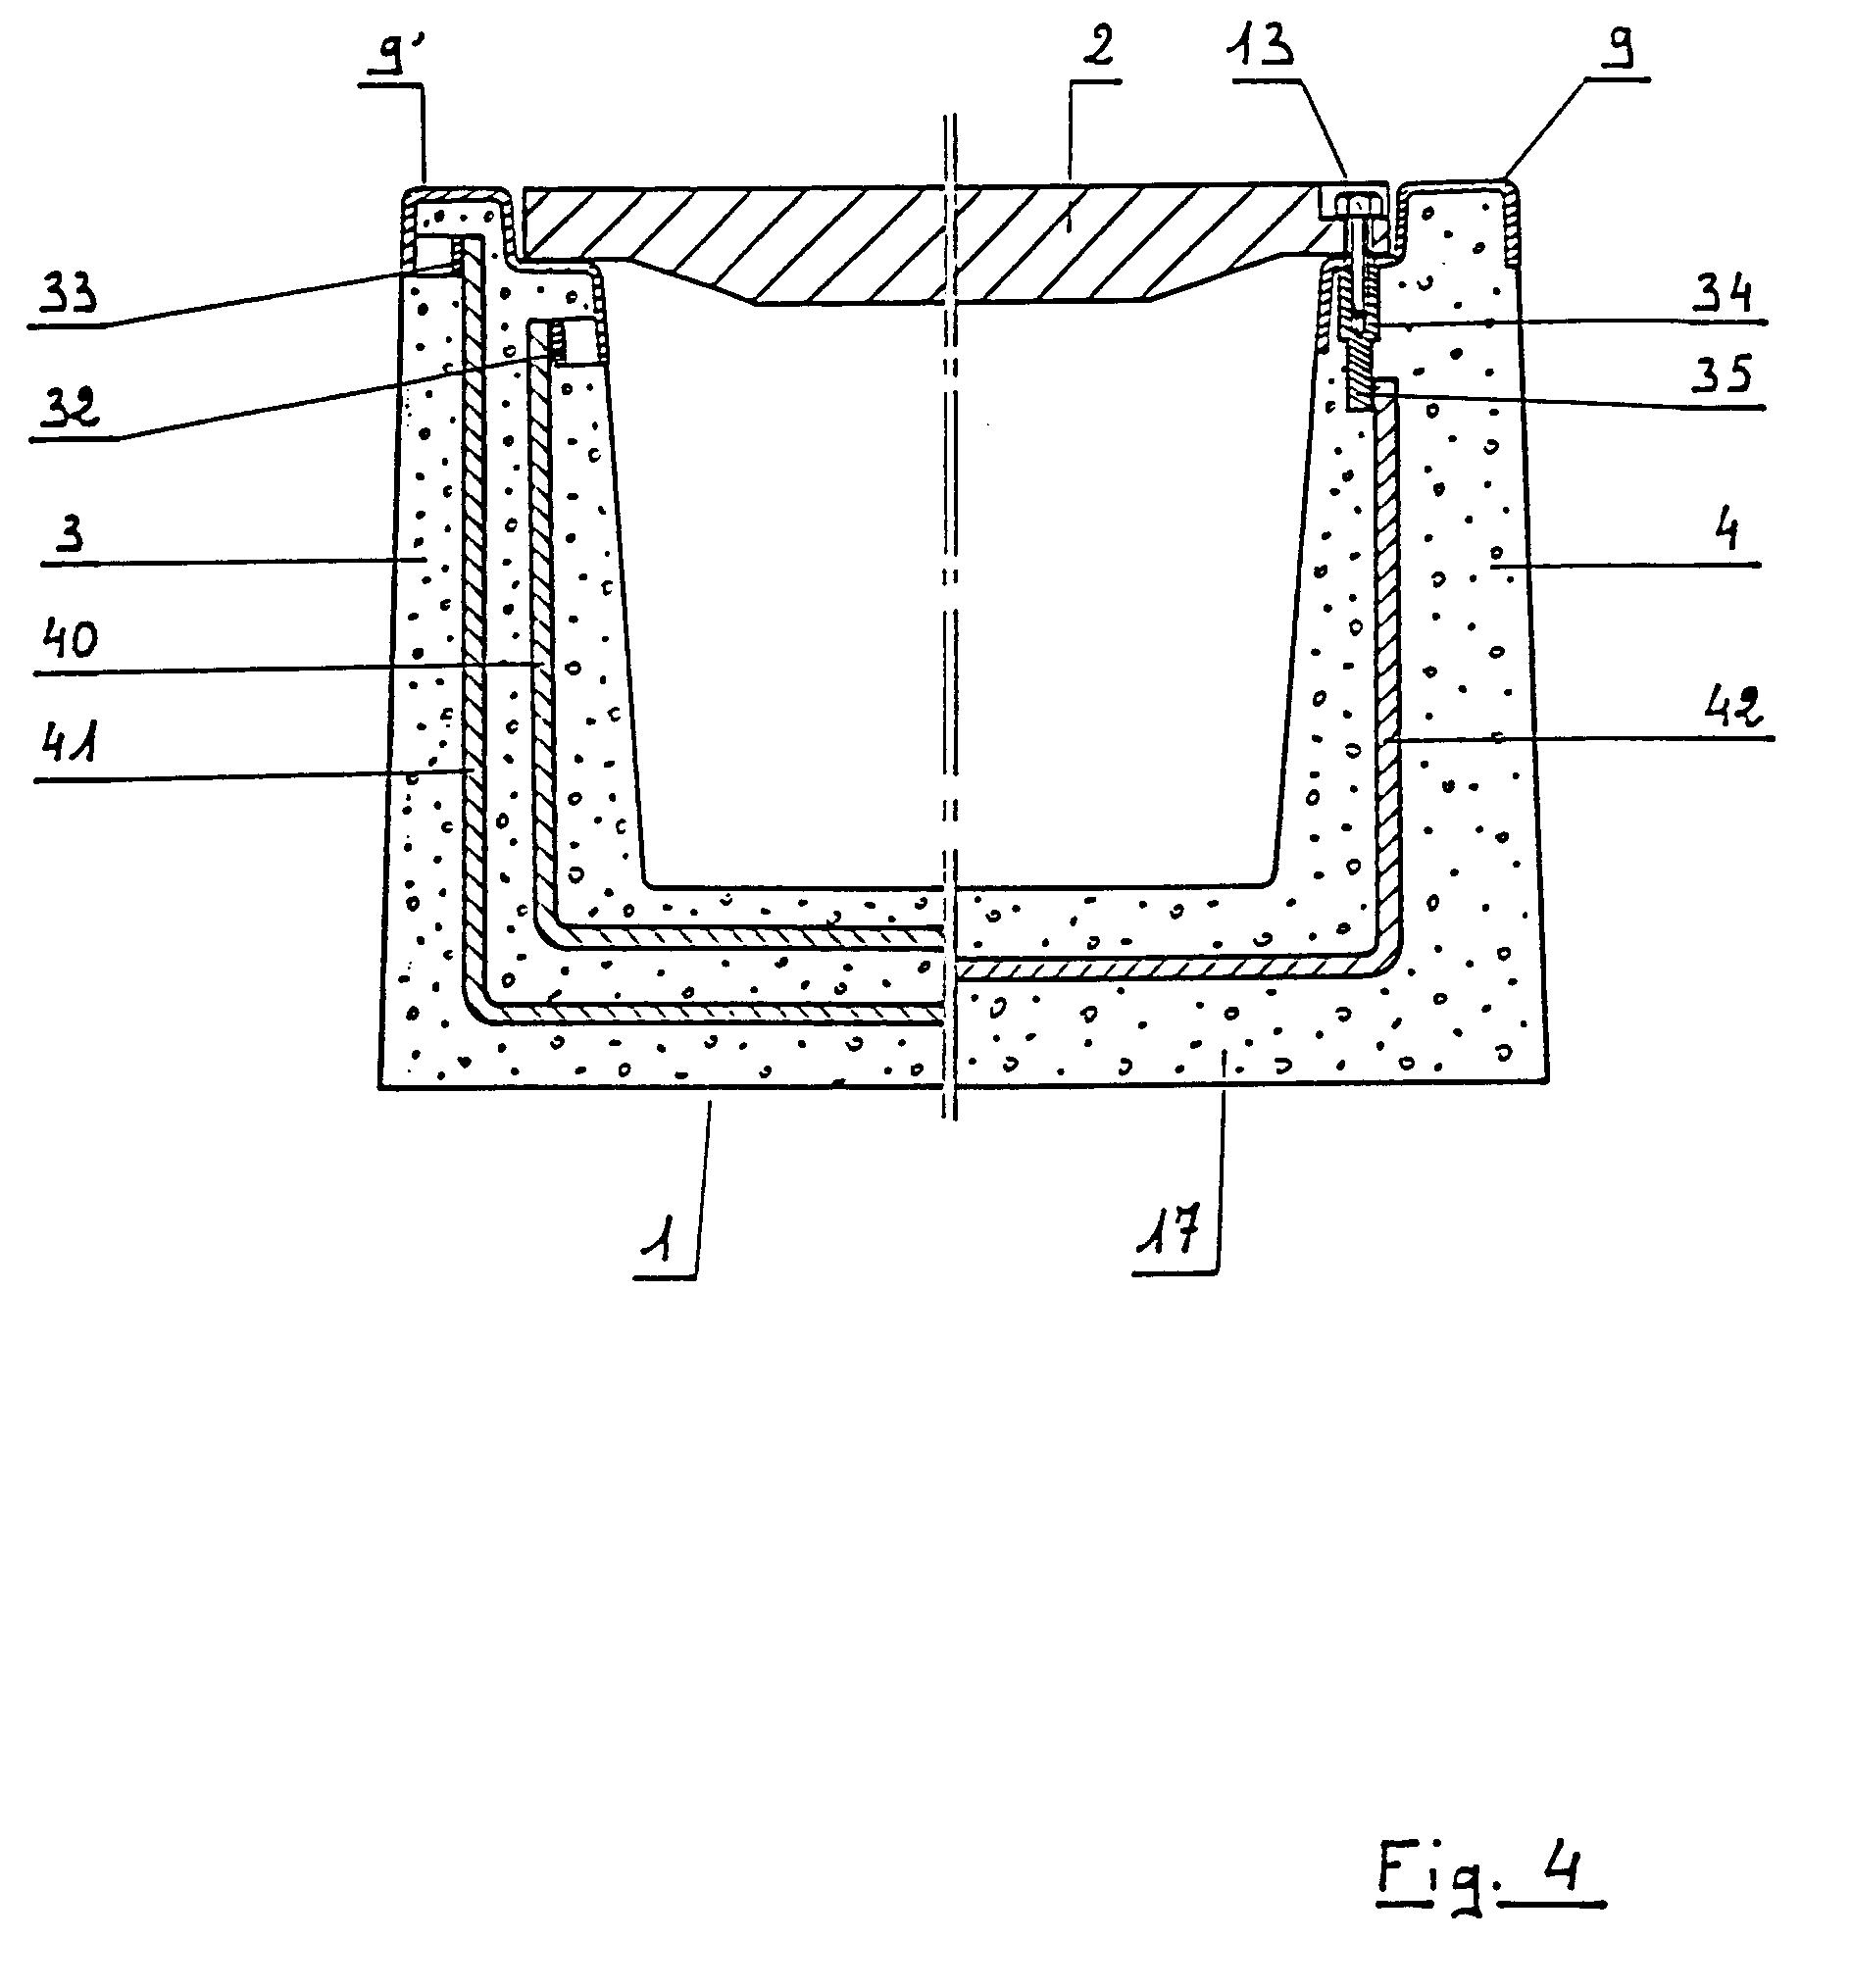 patent ep0675237a2 reinforced concrete gutter element. Black Bedroom Furniture Sets. Home Design Ideas